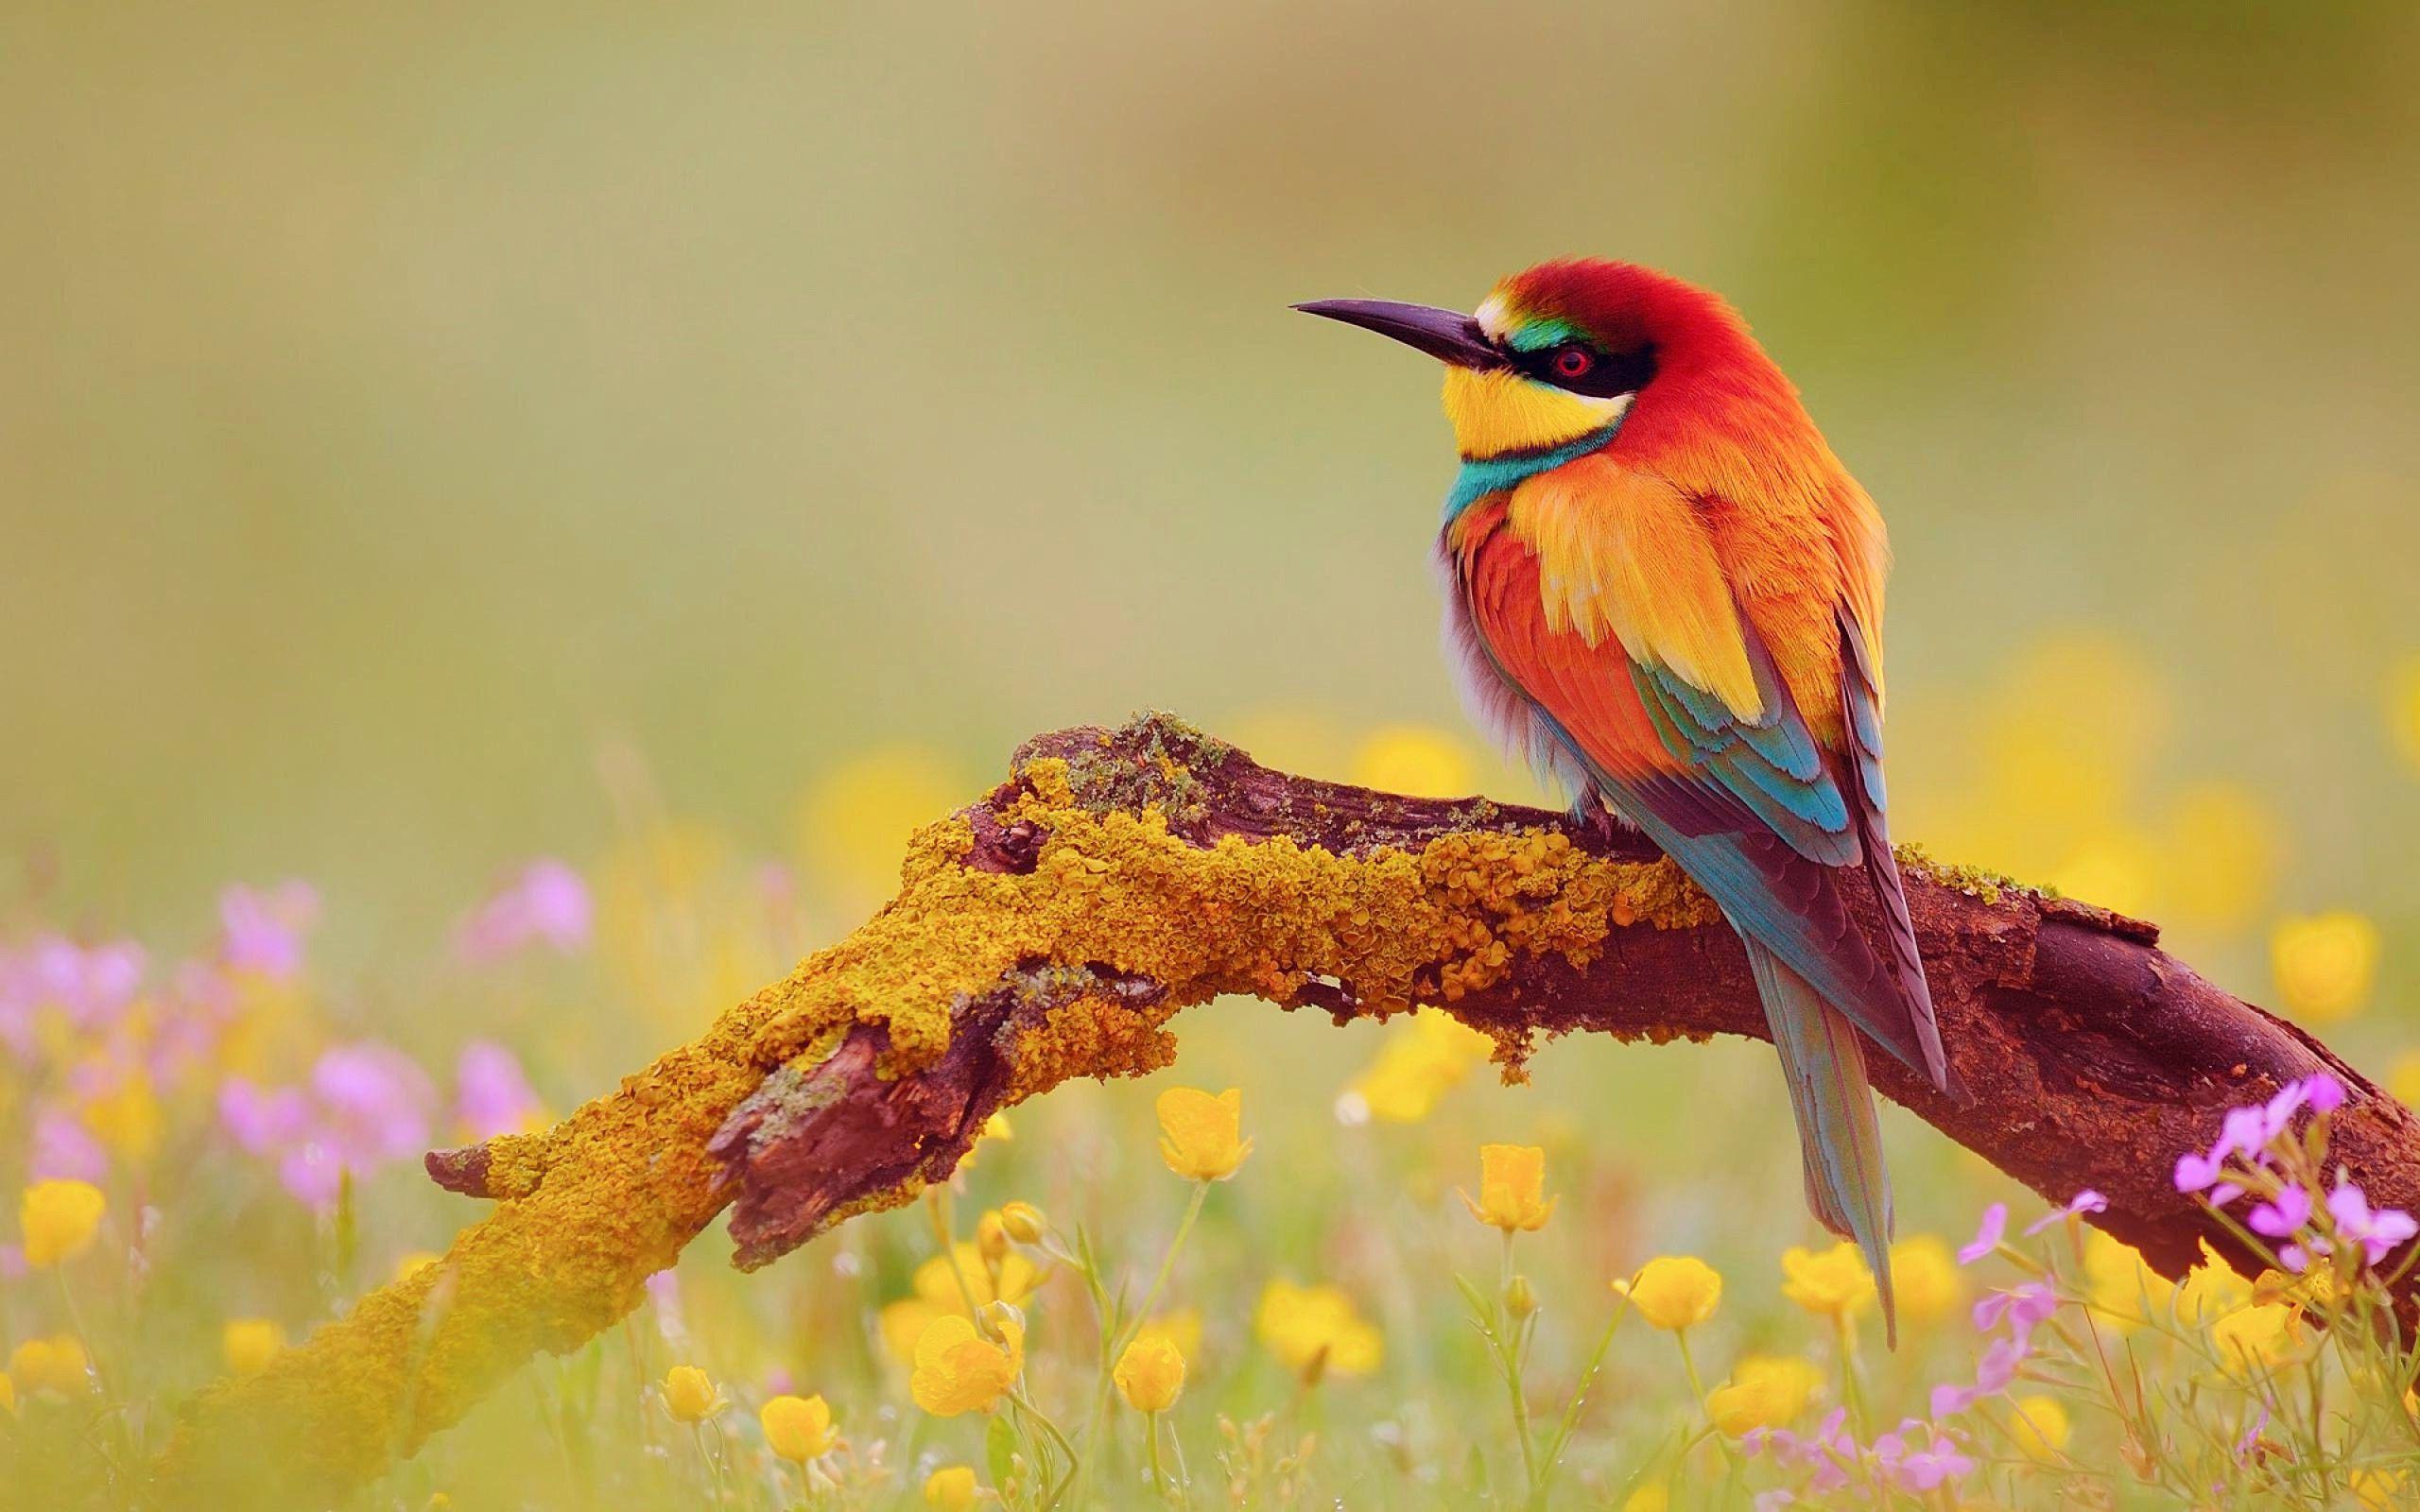 Cute And Pretty Colourful Bird Wallpaper Jpg Jpeg Image 2560 1600 Pixels Scaled 37 Beautiful Bird Wallpaper Birds Wallpaper Hd Most Beautiful Birds